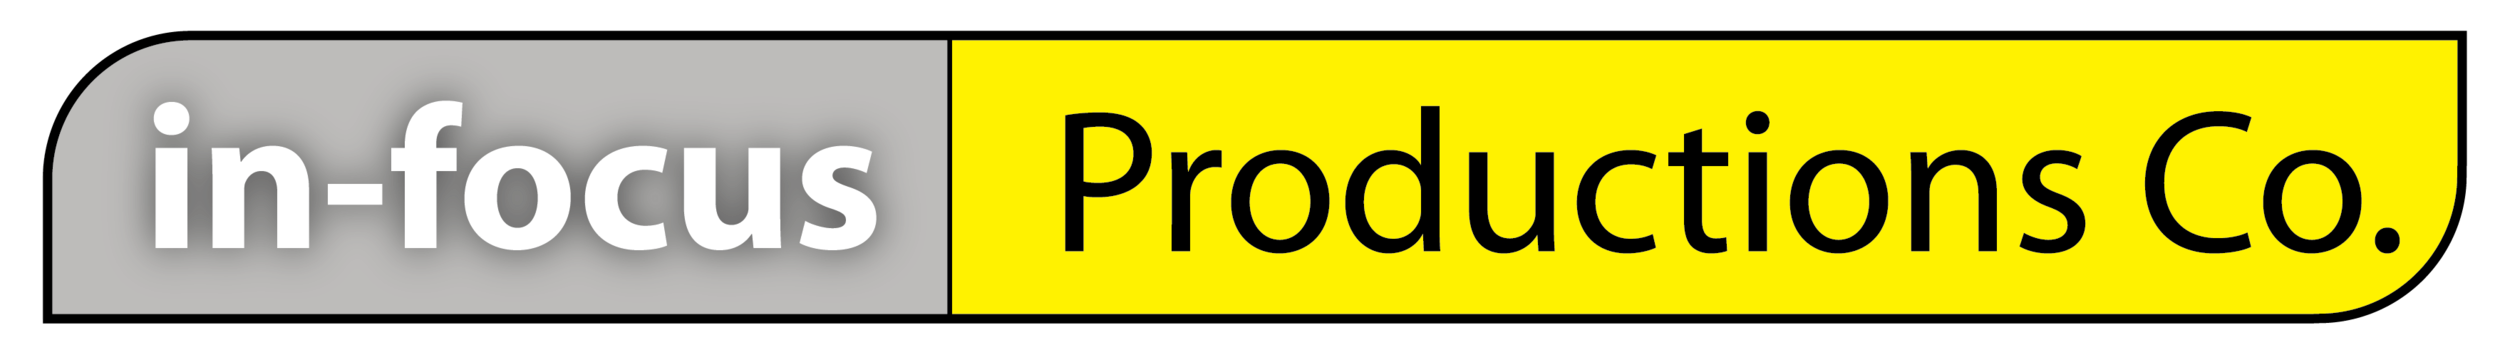 in-focus_Logo-02.png